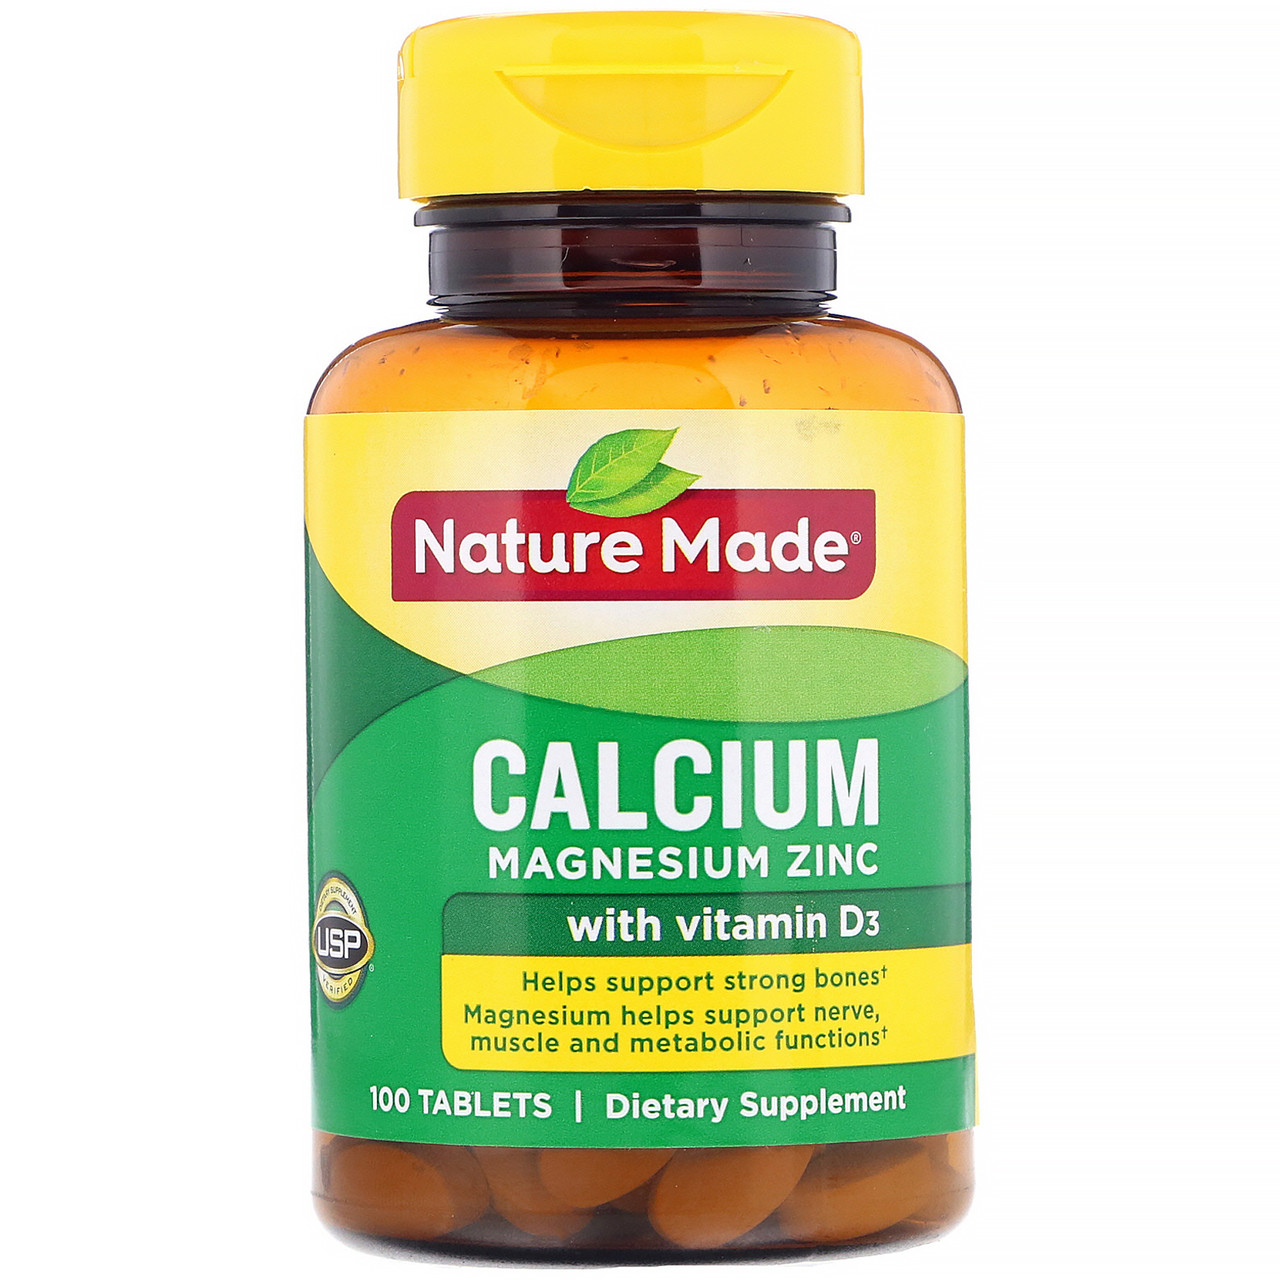 Кальцій-Магній-Цинк, 100 таблеток, Nature Made, Calcium Magnesium Zinc